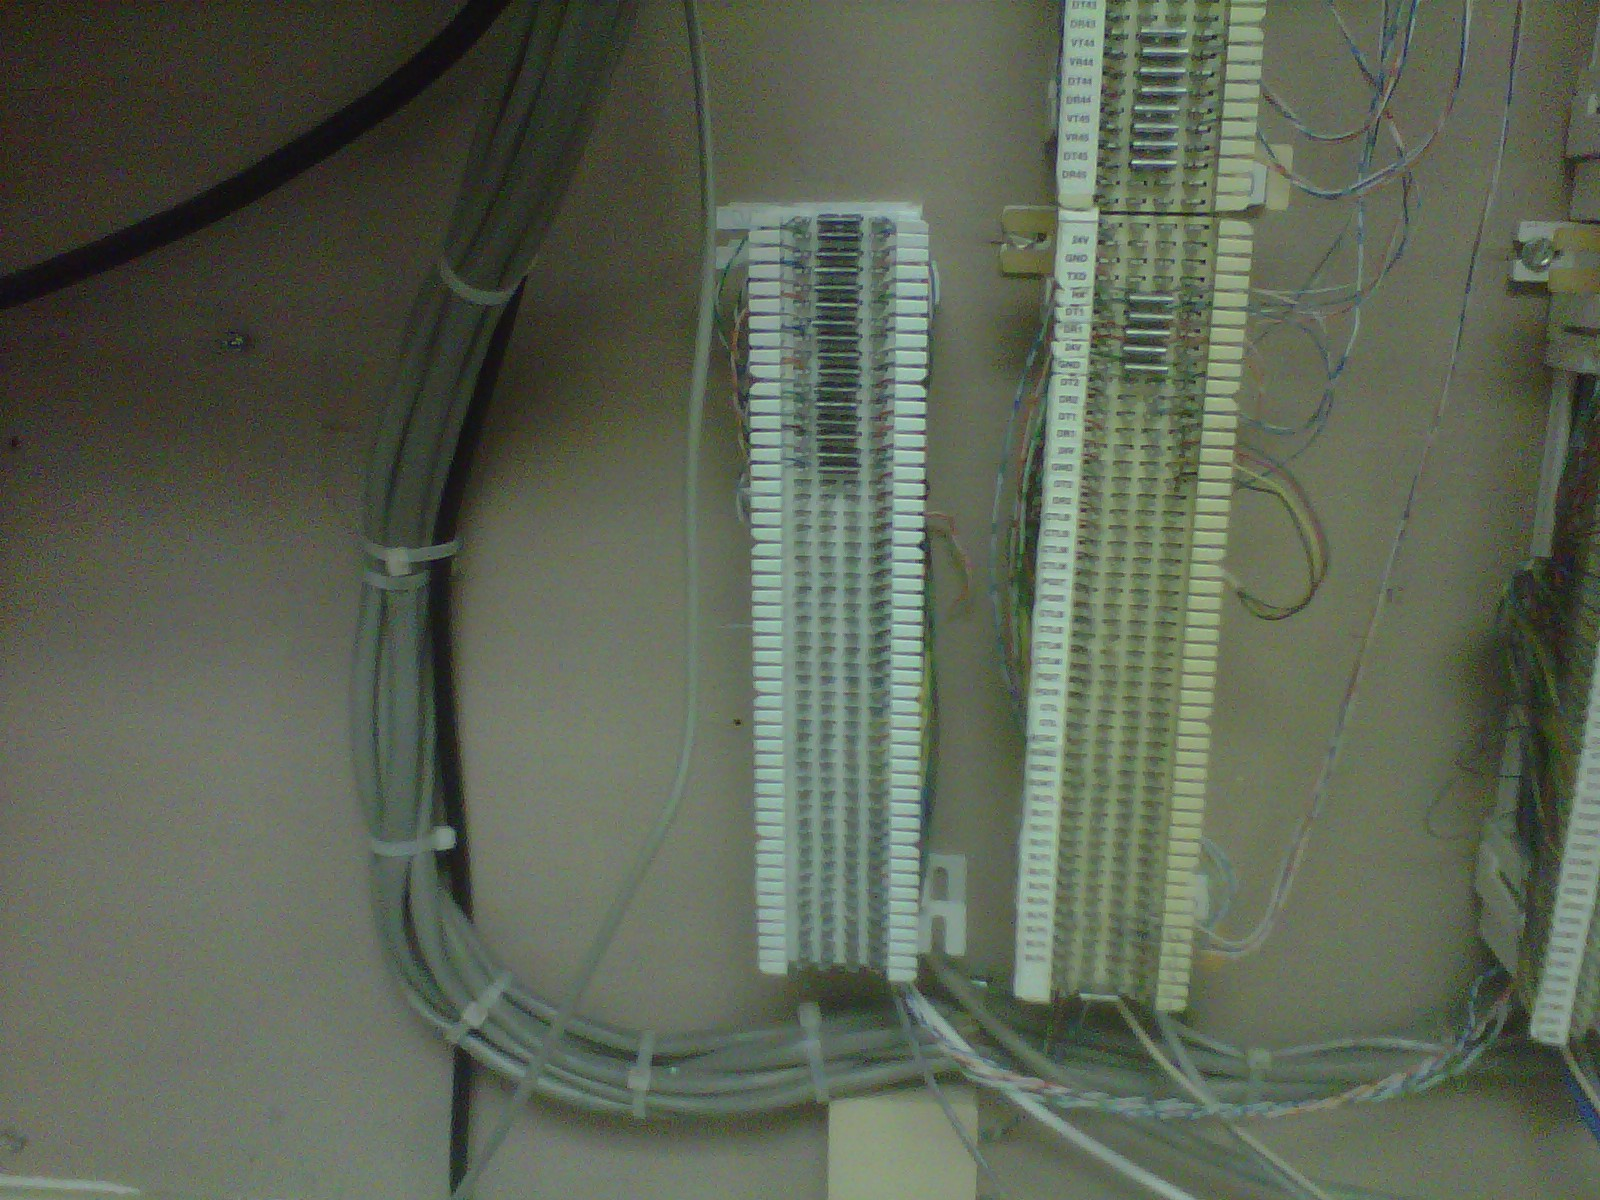 66 Block Wiring Diagram 25 Pair Honda Civic 2000 Nyphonejacks Installation Of Linksys E1000 Router And Spa